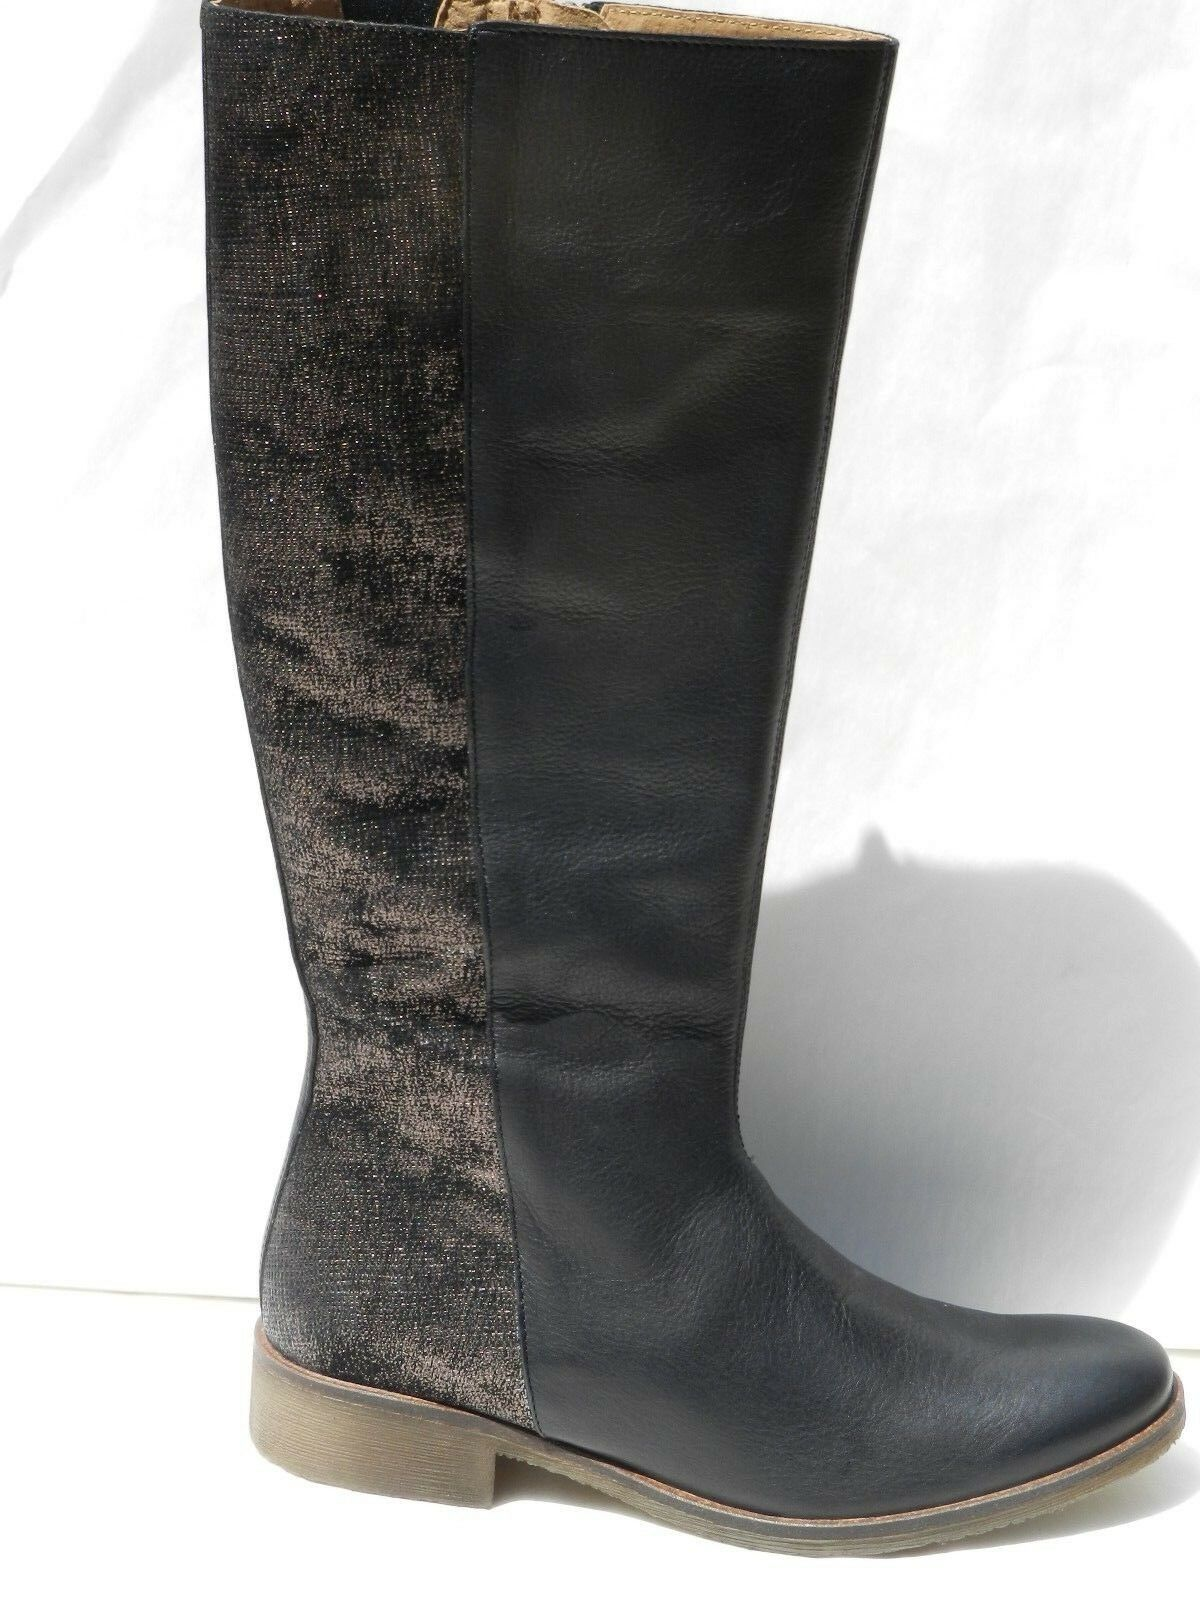 Bottes Kickers Leging Chaussures Femme 38 38 38 Cavalières Genou Tall Bottes UK5 Neuf 4b53d1